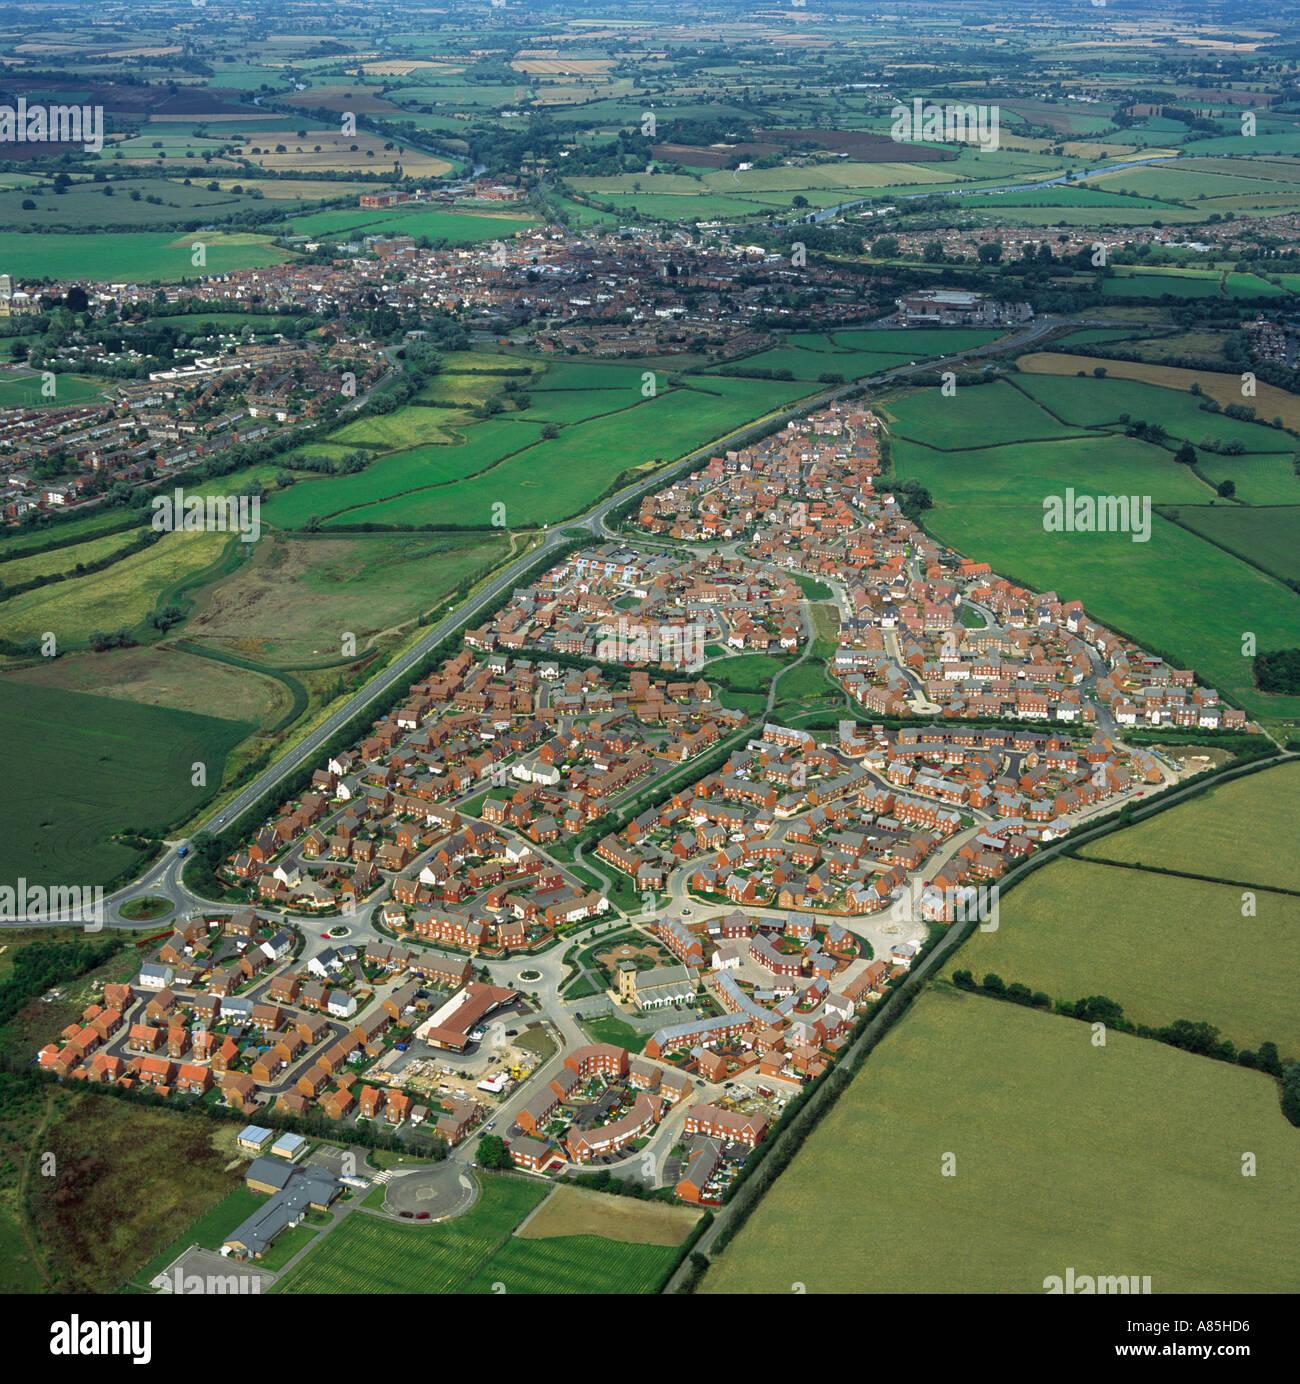 Modern edge of town housing estate UK aerial view - Stock Image